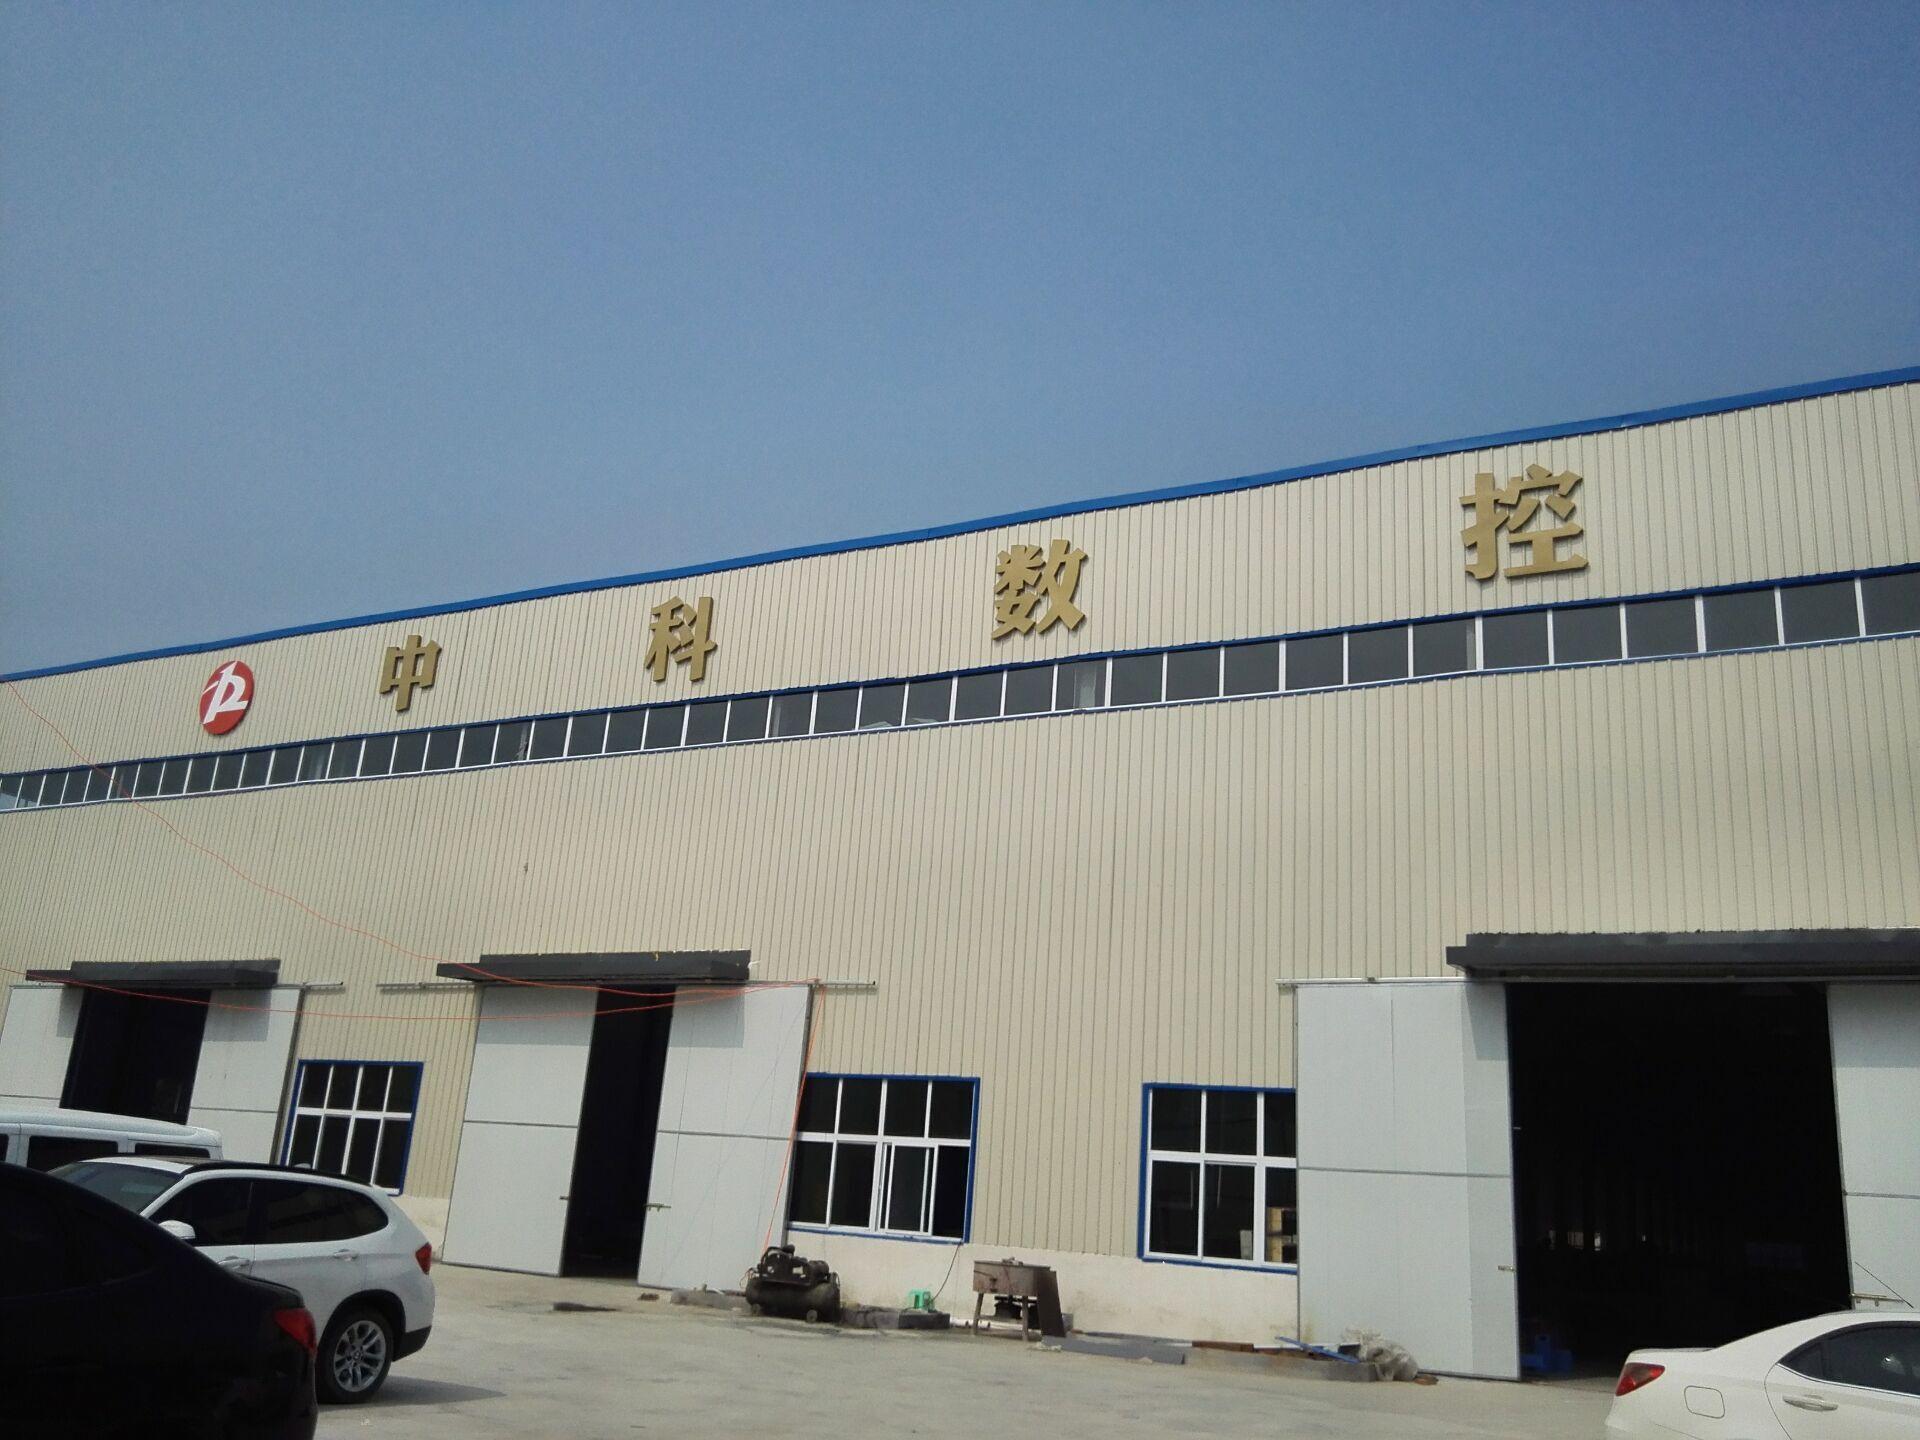 Professional cnc router manufacture------JINAN ZHONGKE CNC ROUTER